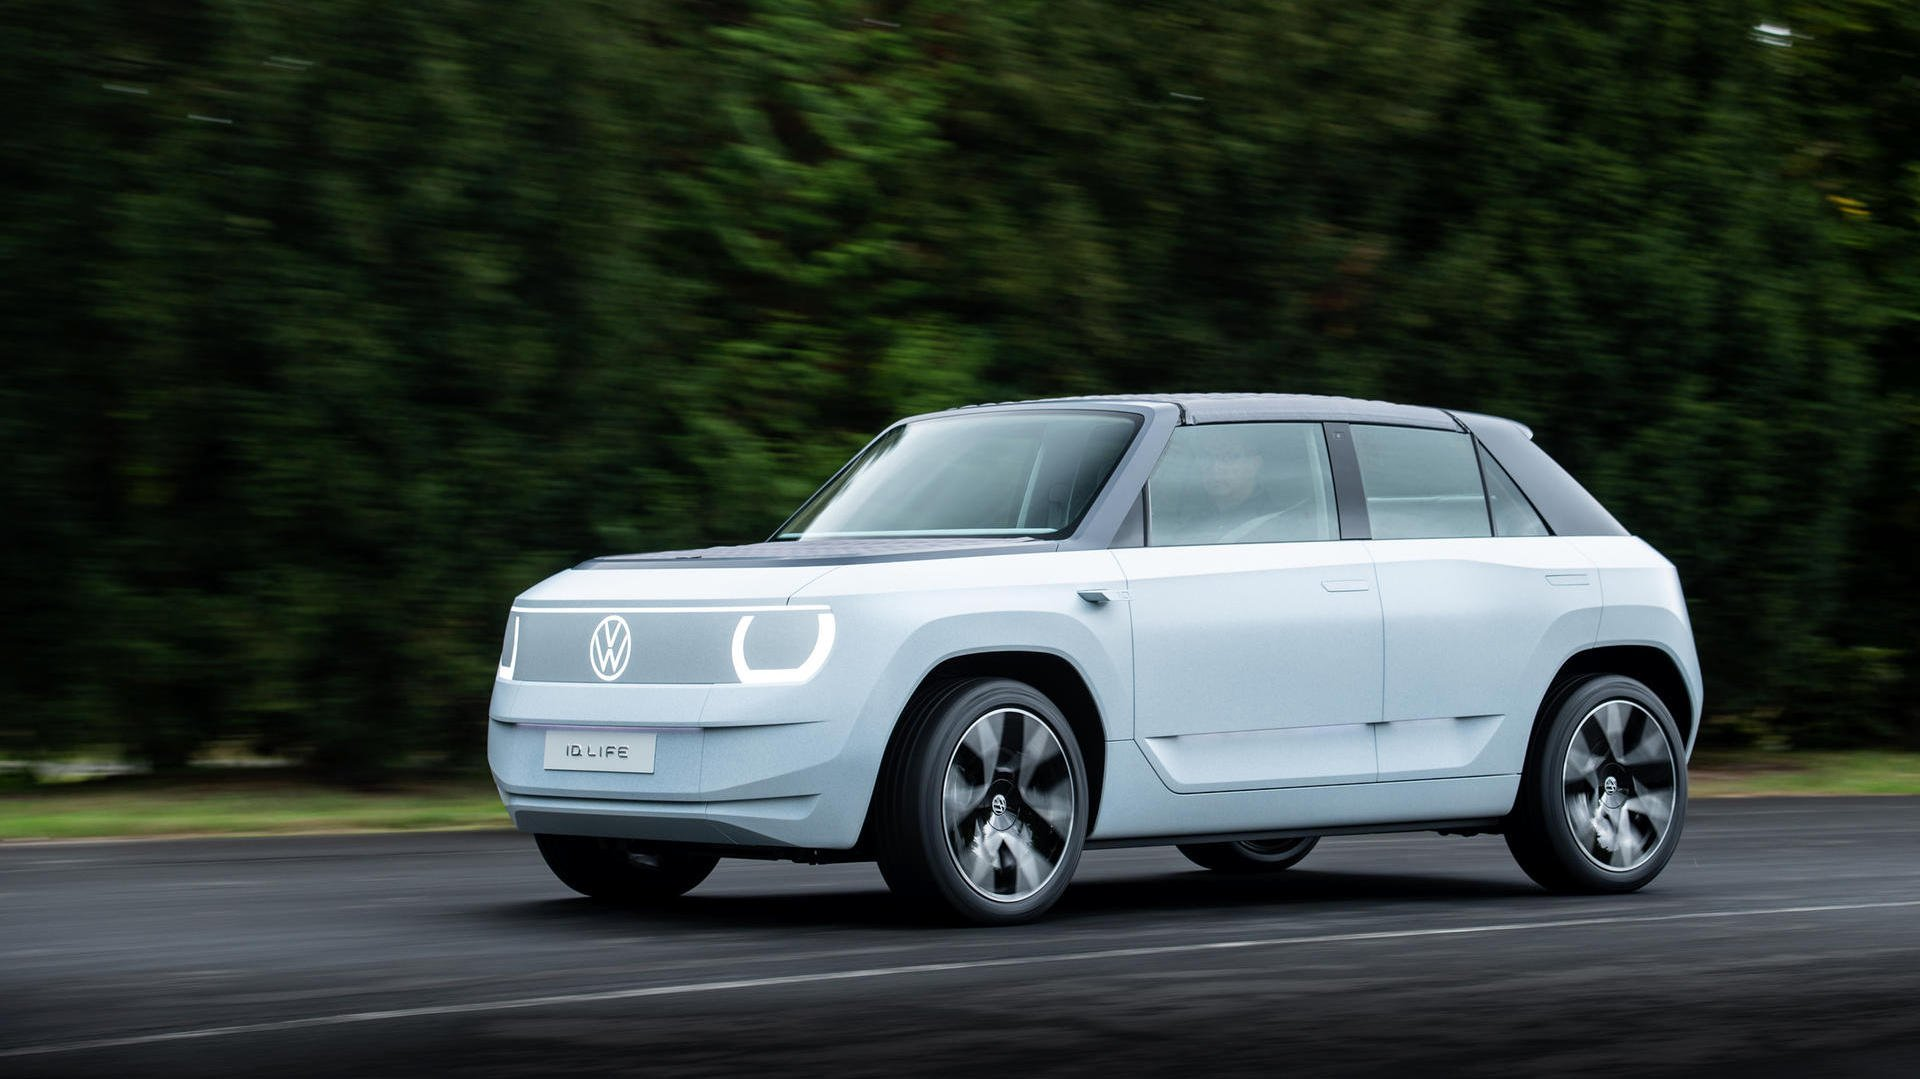 Neuer ID Life: VW enthüllt sein billigstes E-Fahrzeug